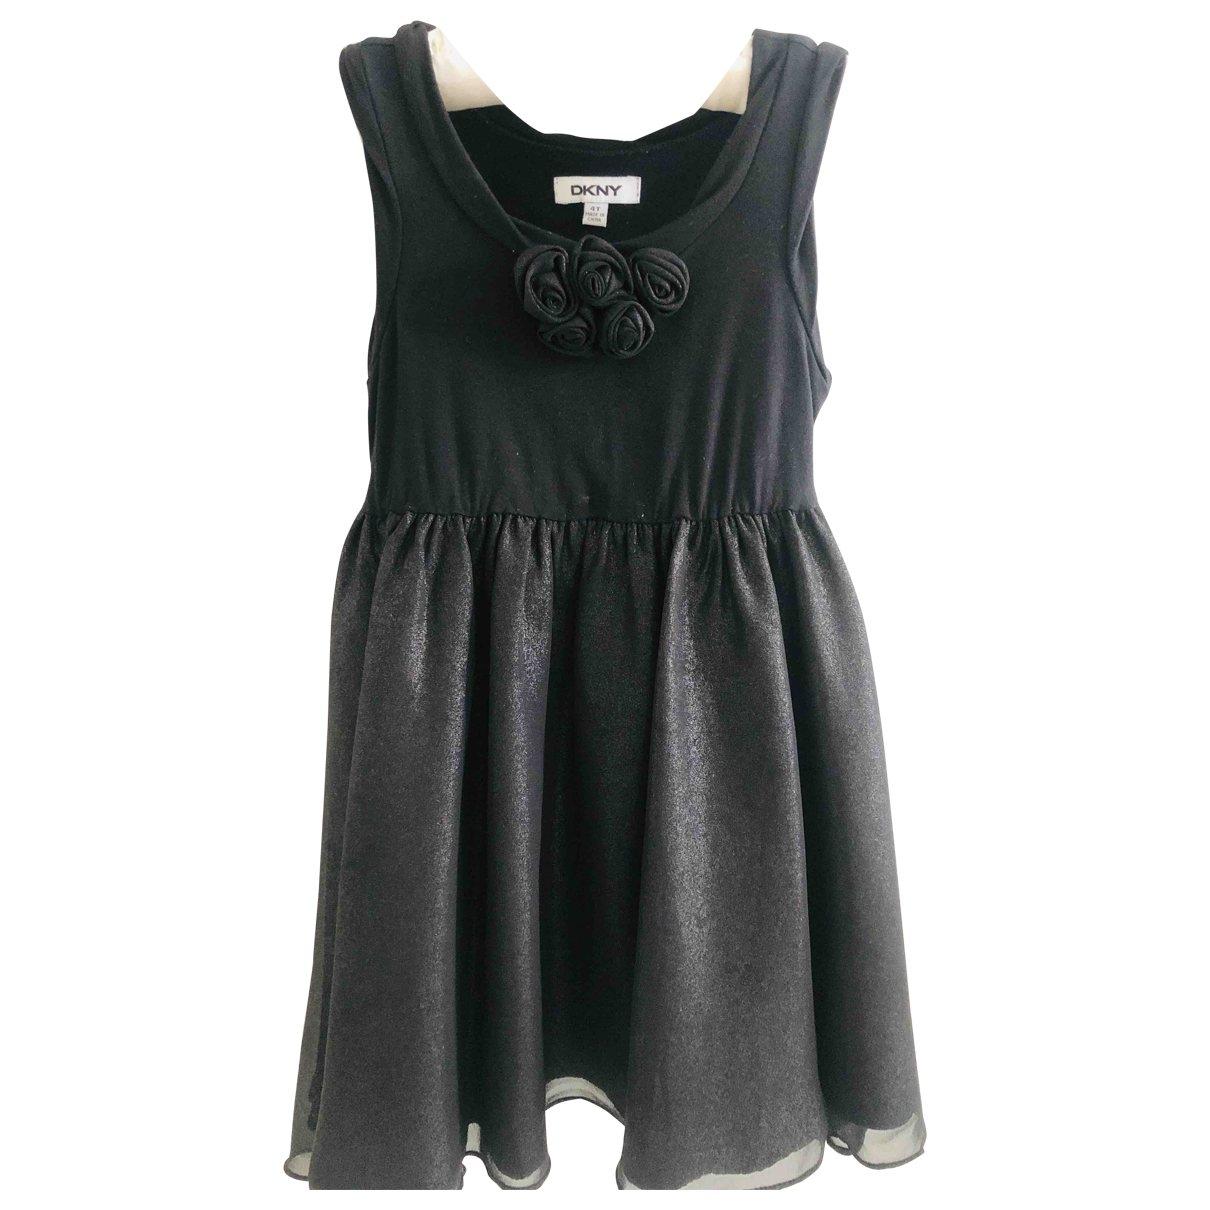 Dkny - Robe    pour enfant en coton - elasthane - noir